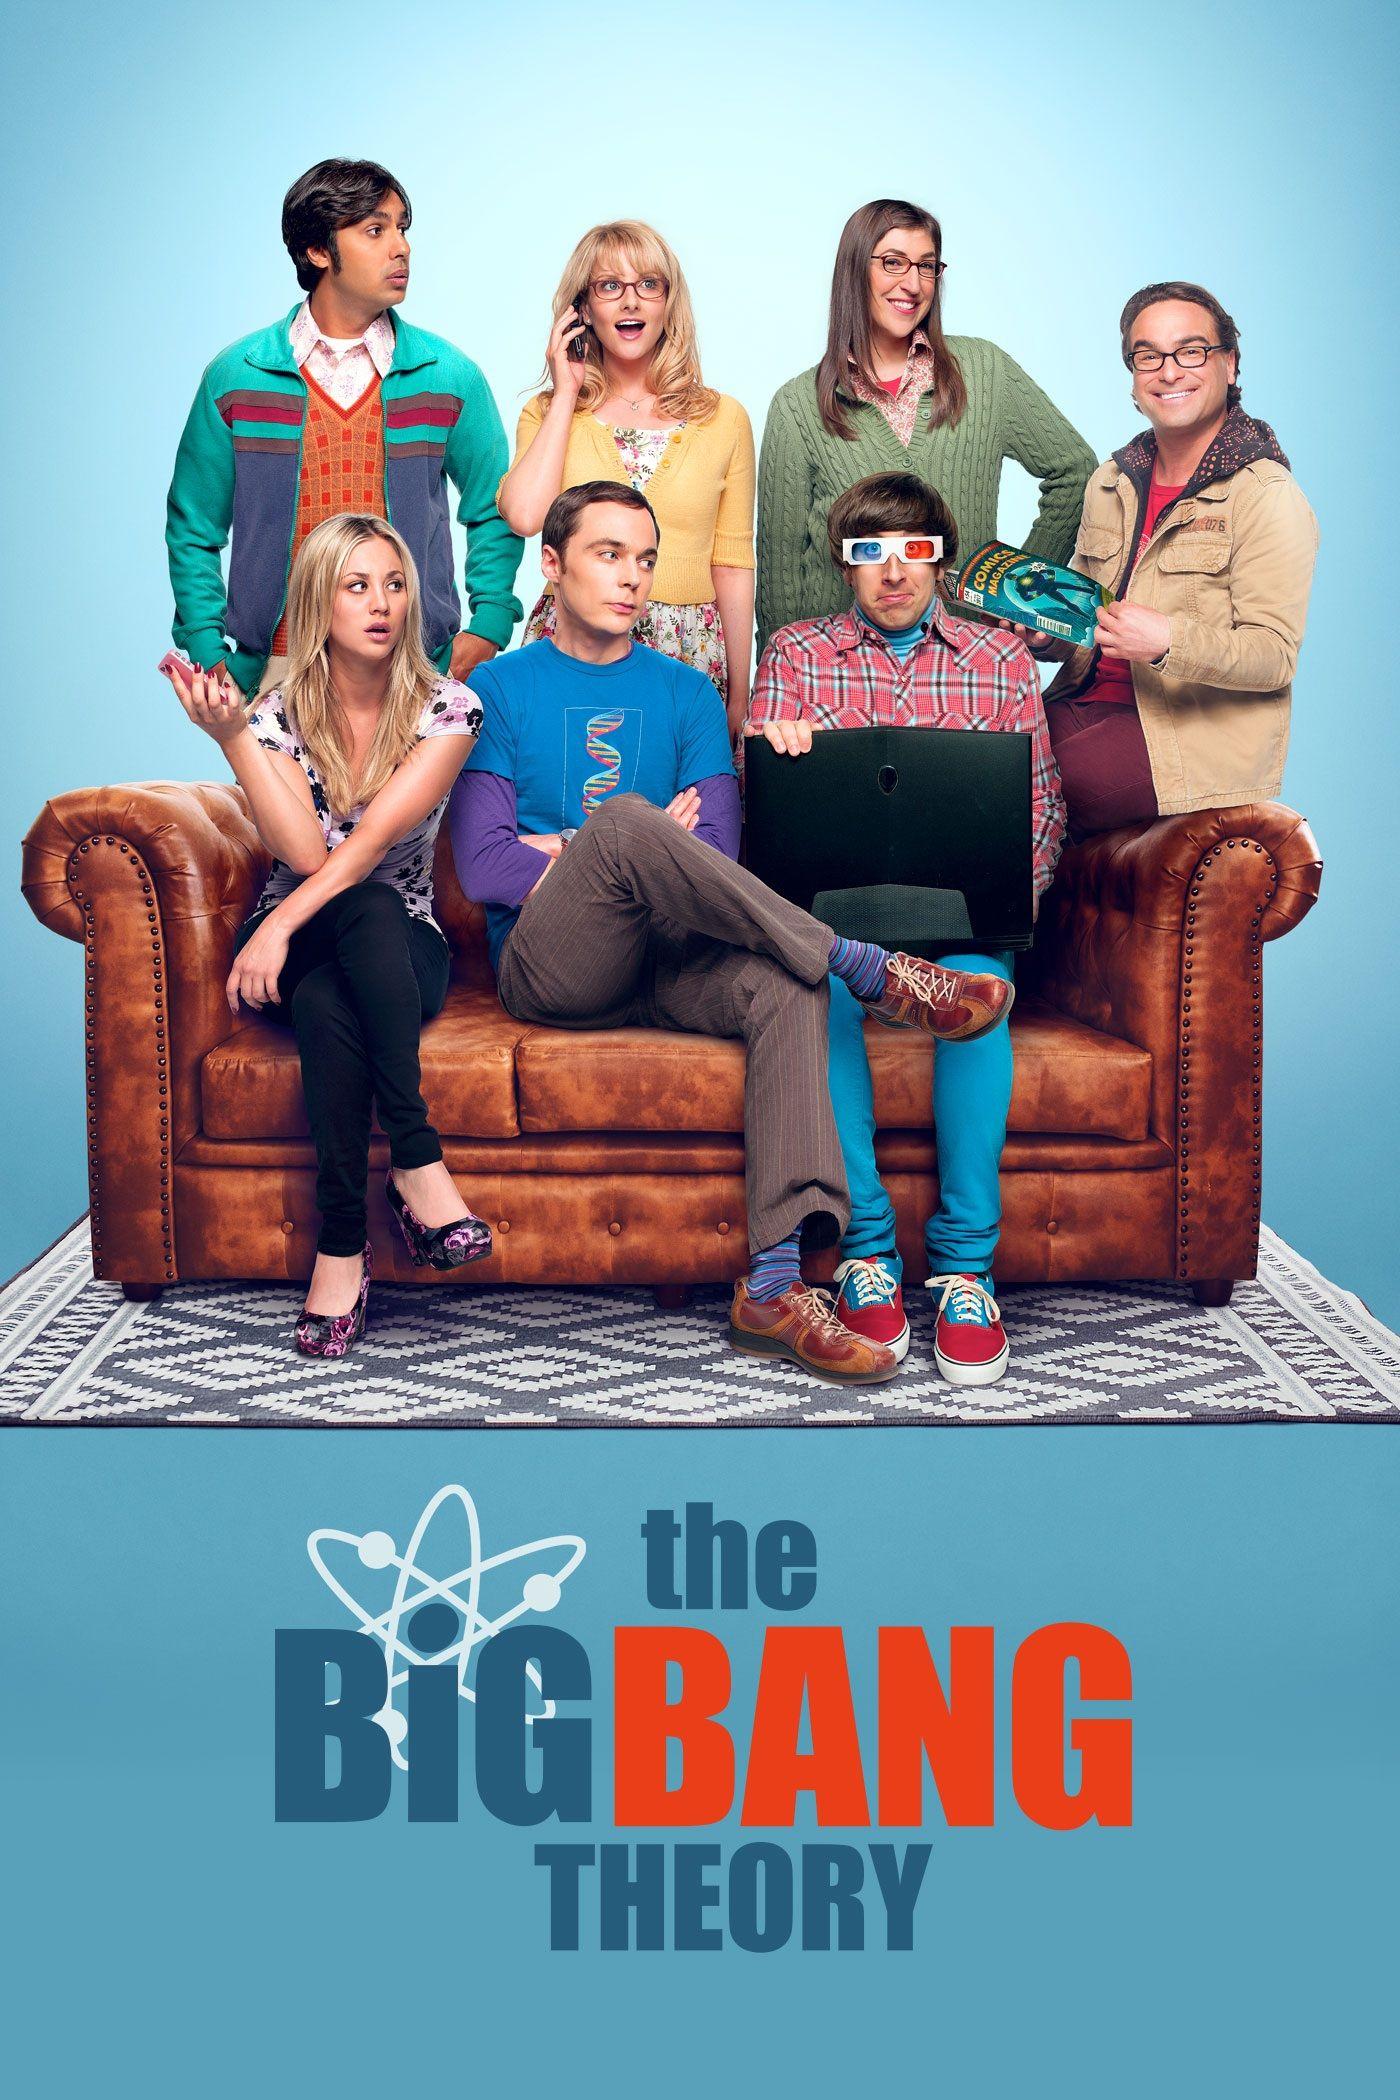 The Big Bang Theory Streaming Gratuit : theory, streaming, gratuit, Plein, Streaming, Gratuit, Complet